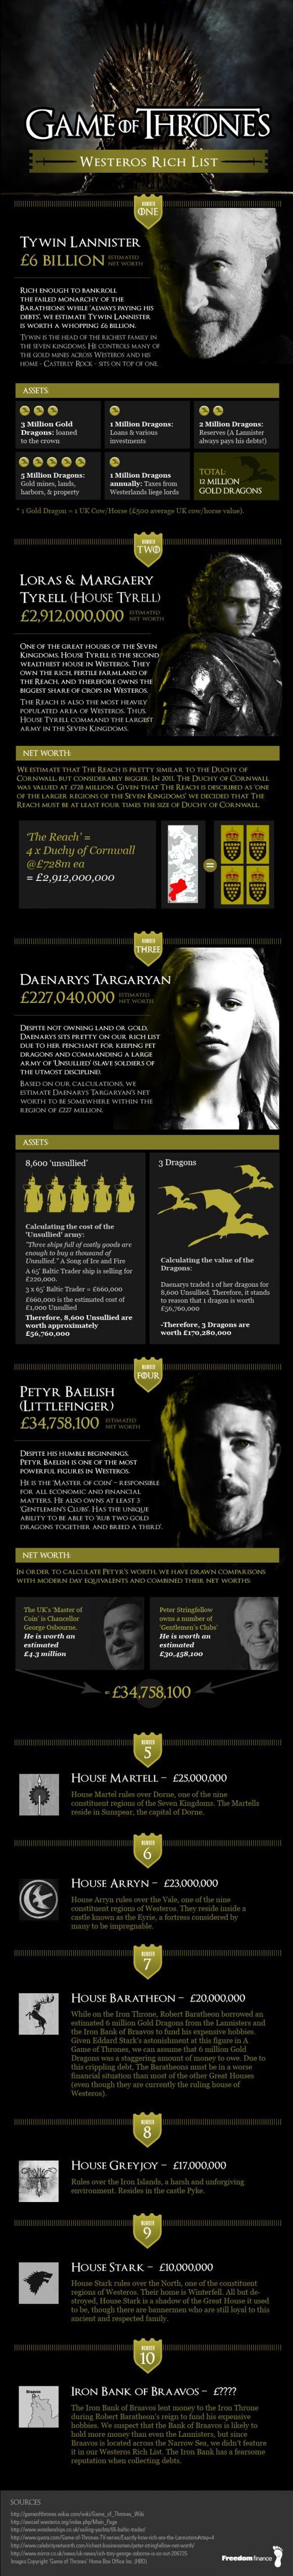 Game of Thrones Rich List infographic shows Westeros' net worth | Blastr